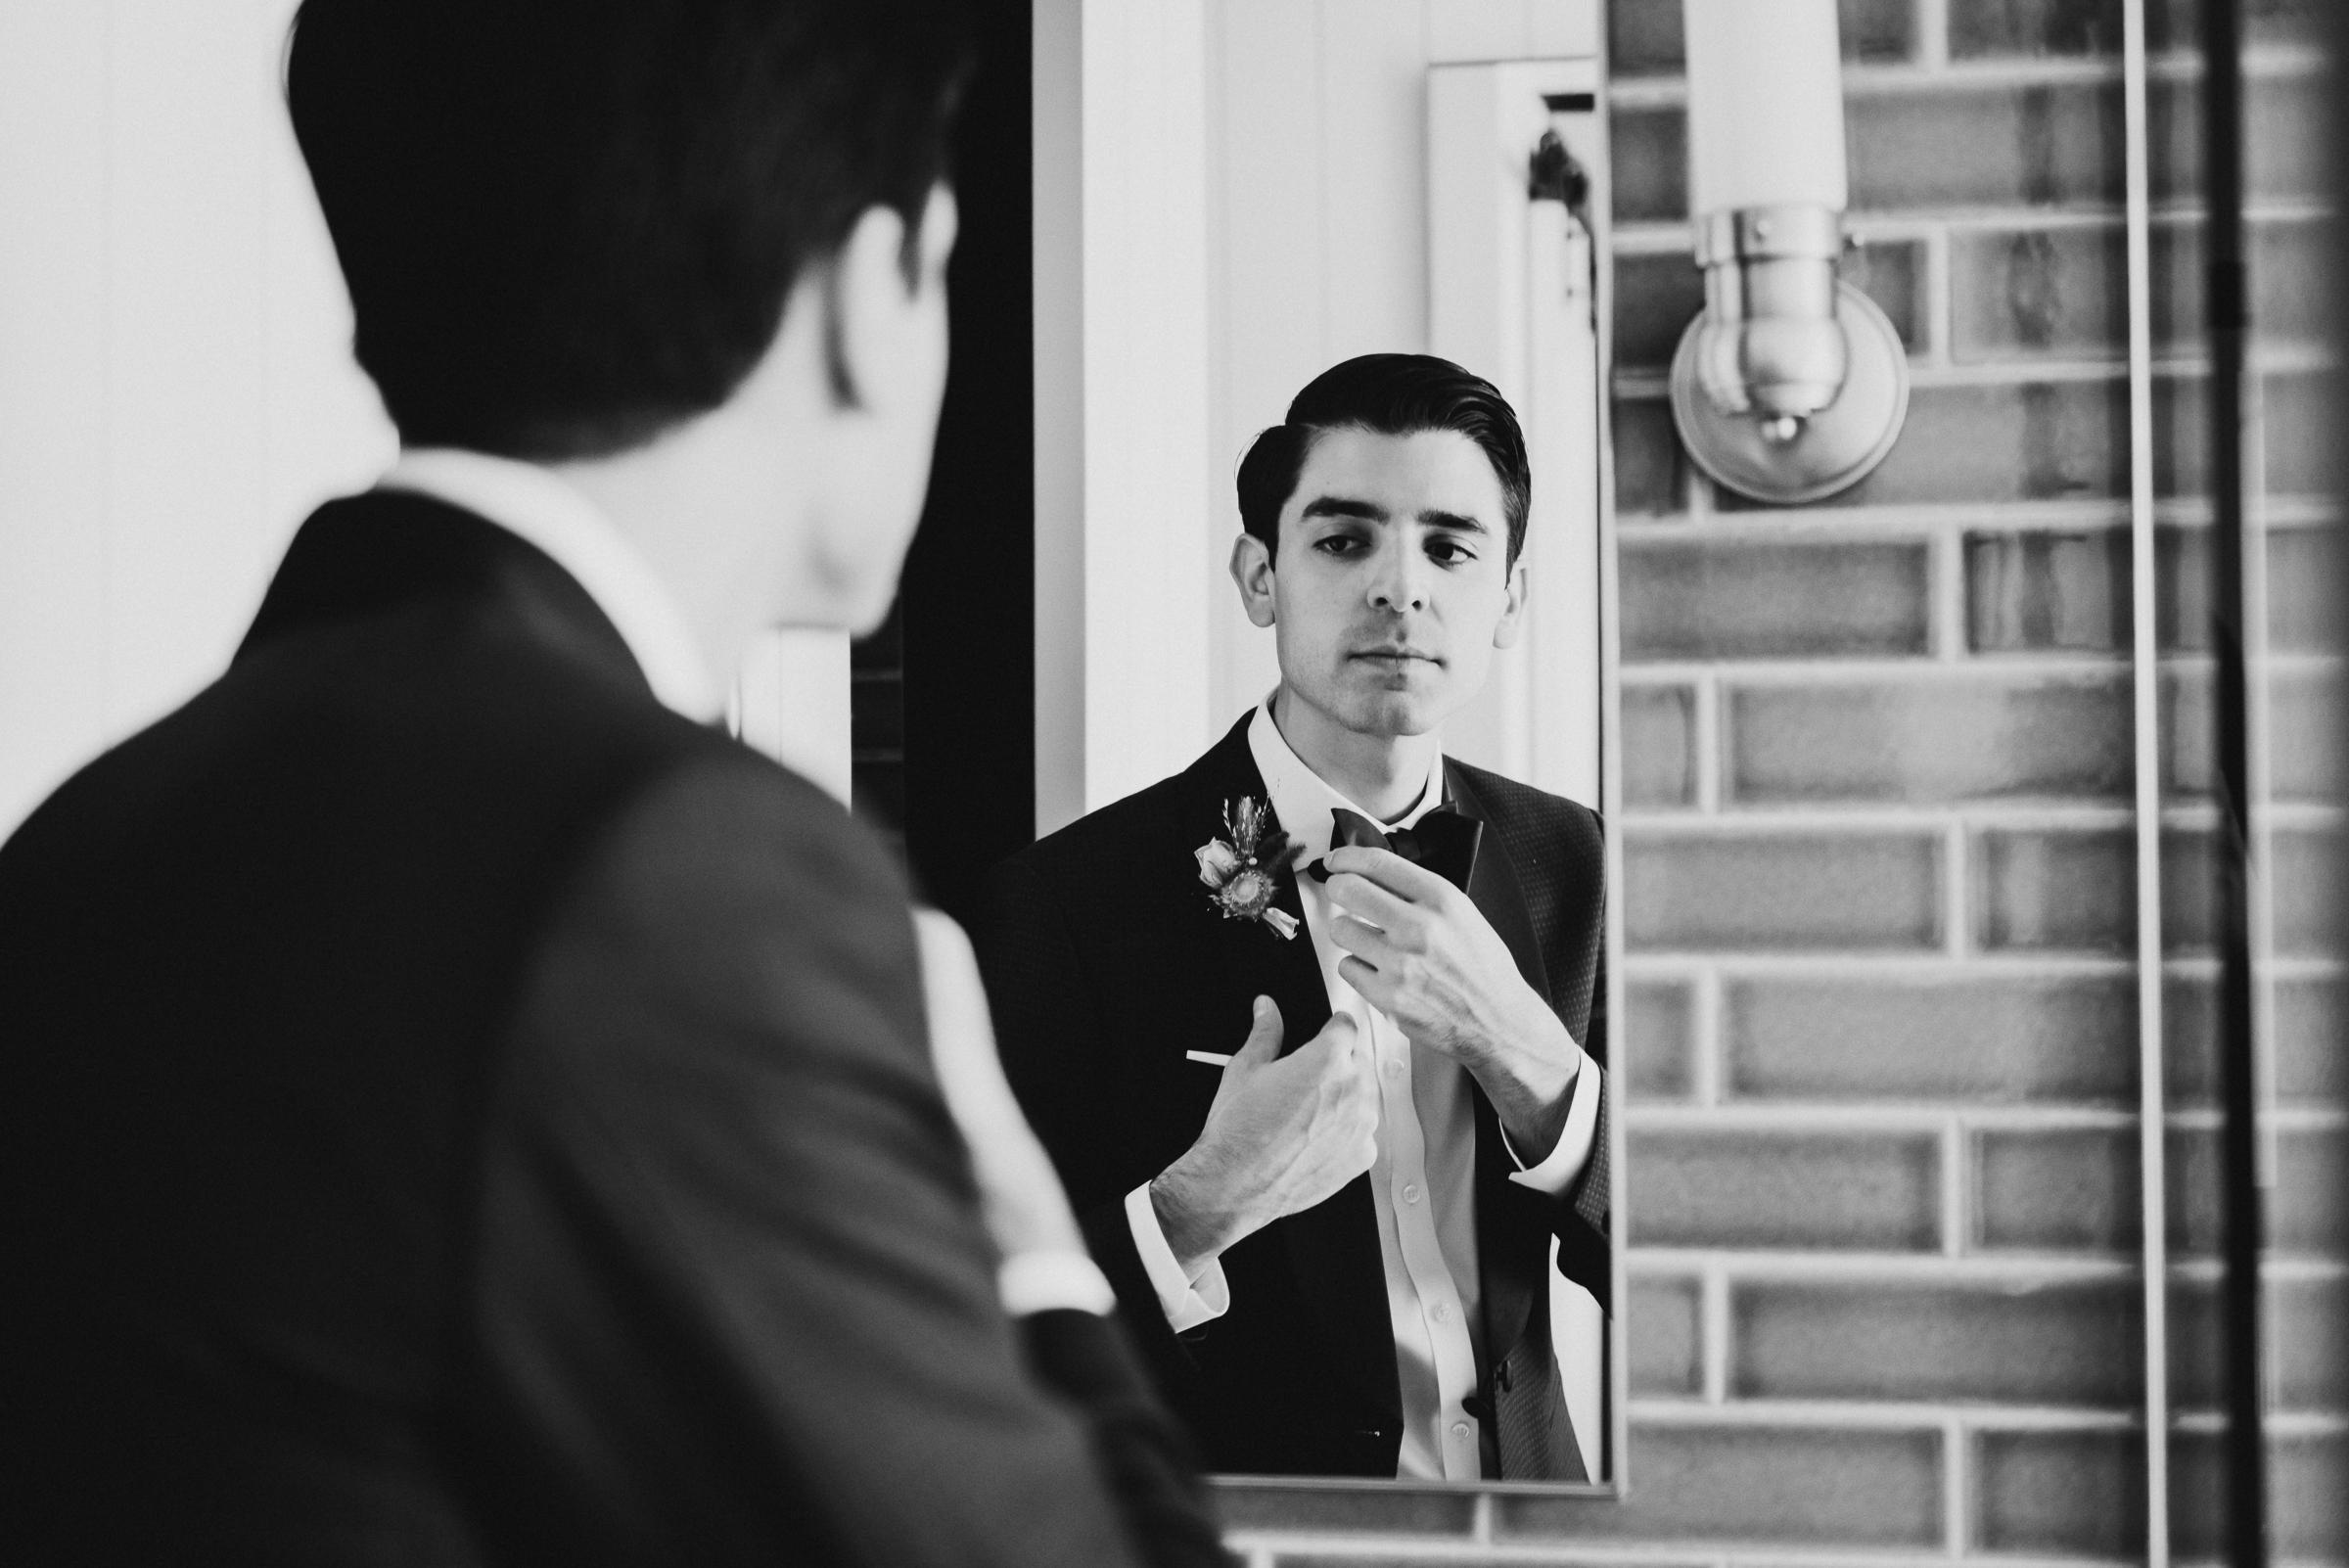 Brooklyn-Winery-NYC-Editorial-Documentary-Wedding-Photographer-Gina-Oli-25.jpg